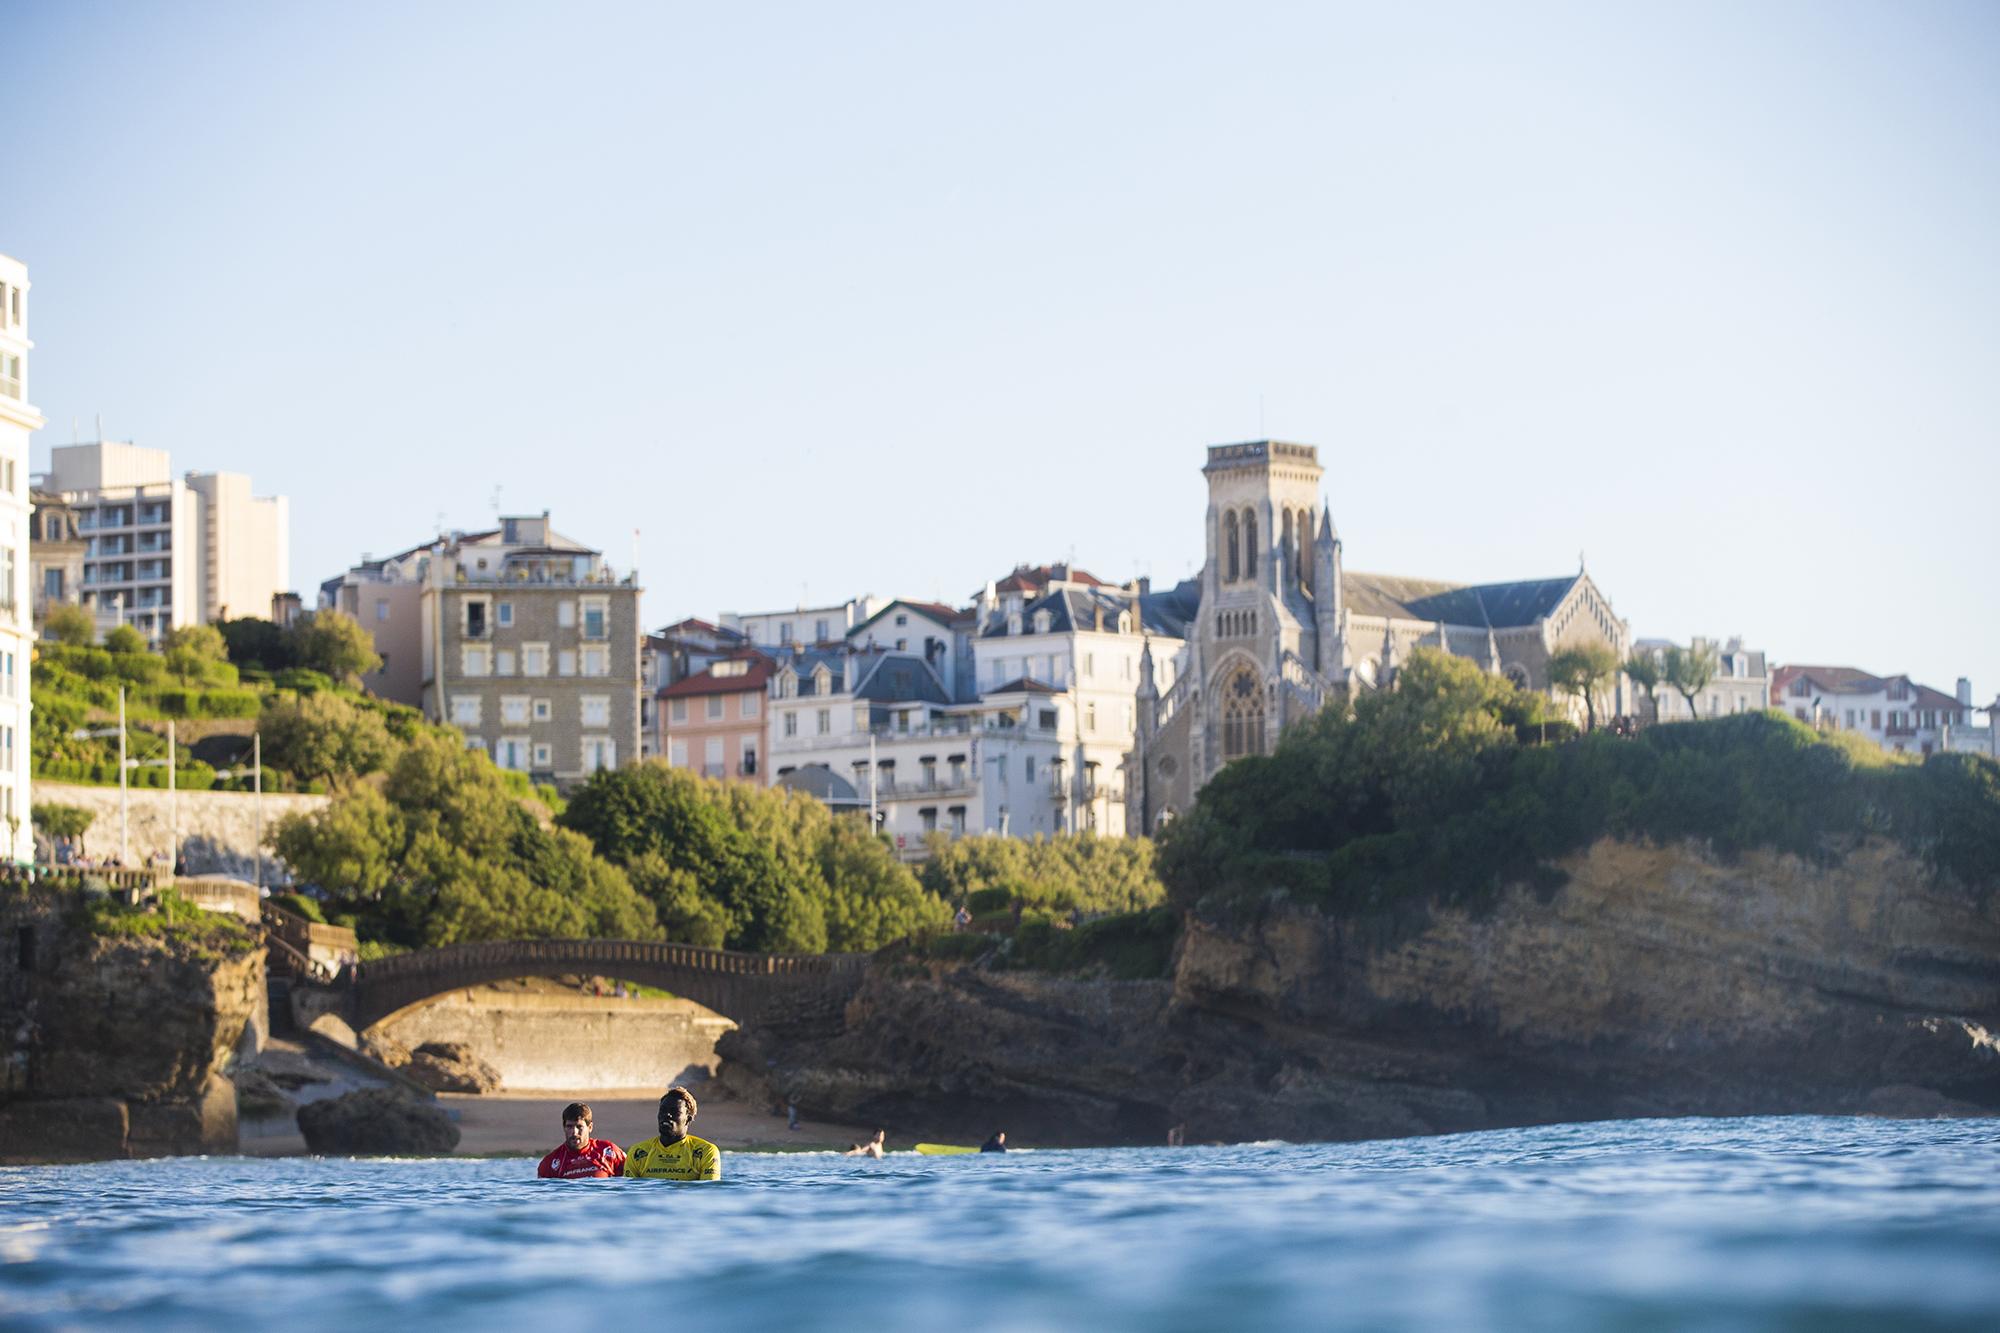 ambiance-ISA-world-surfing-games-2017-biarritz-guillaume-arrieta-we-creative